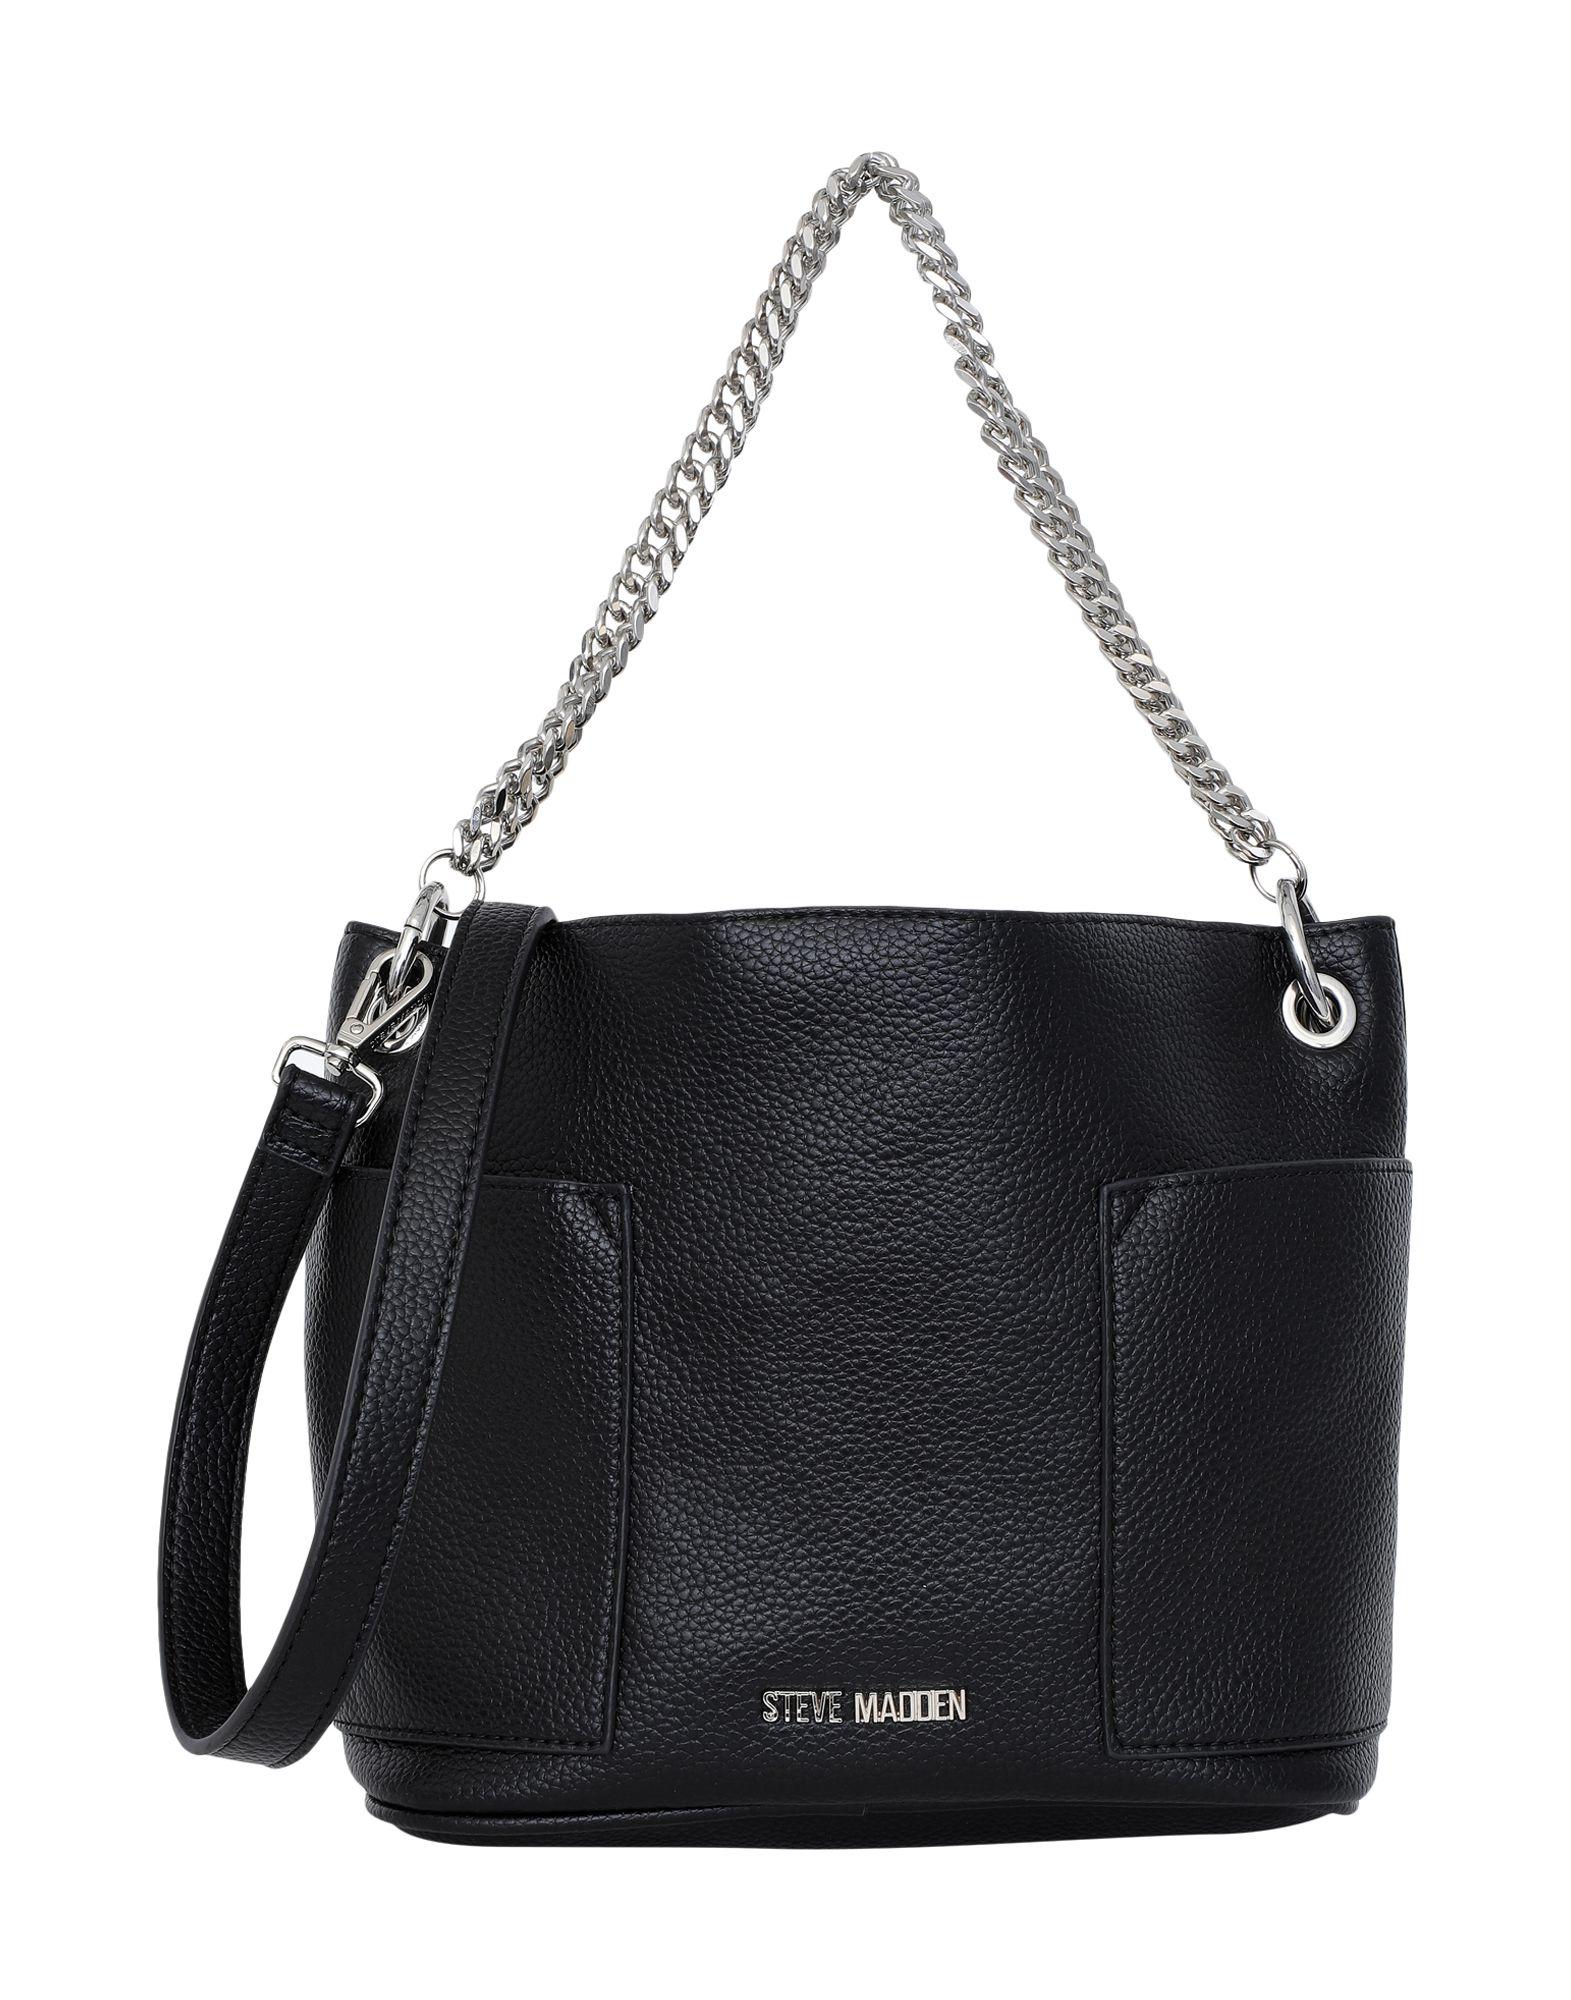 Steve Madden Handbags - Steve Madden Women - YOOX United States 7ffe7126cf030